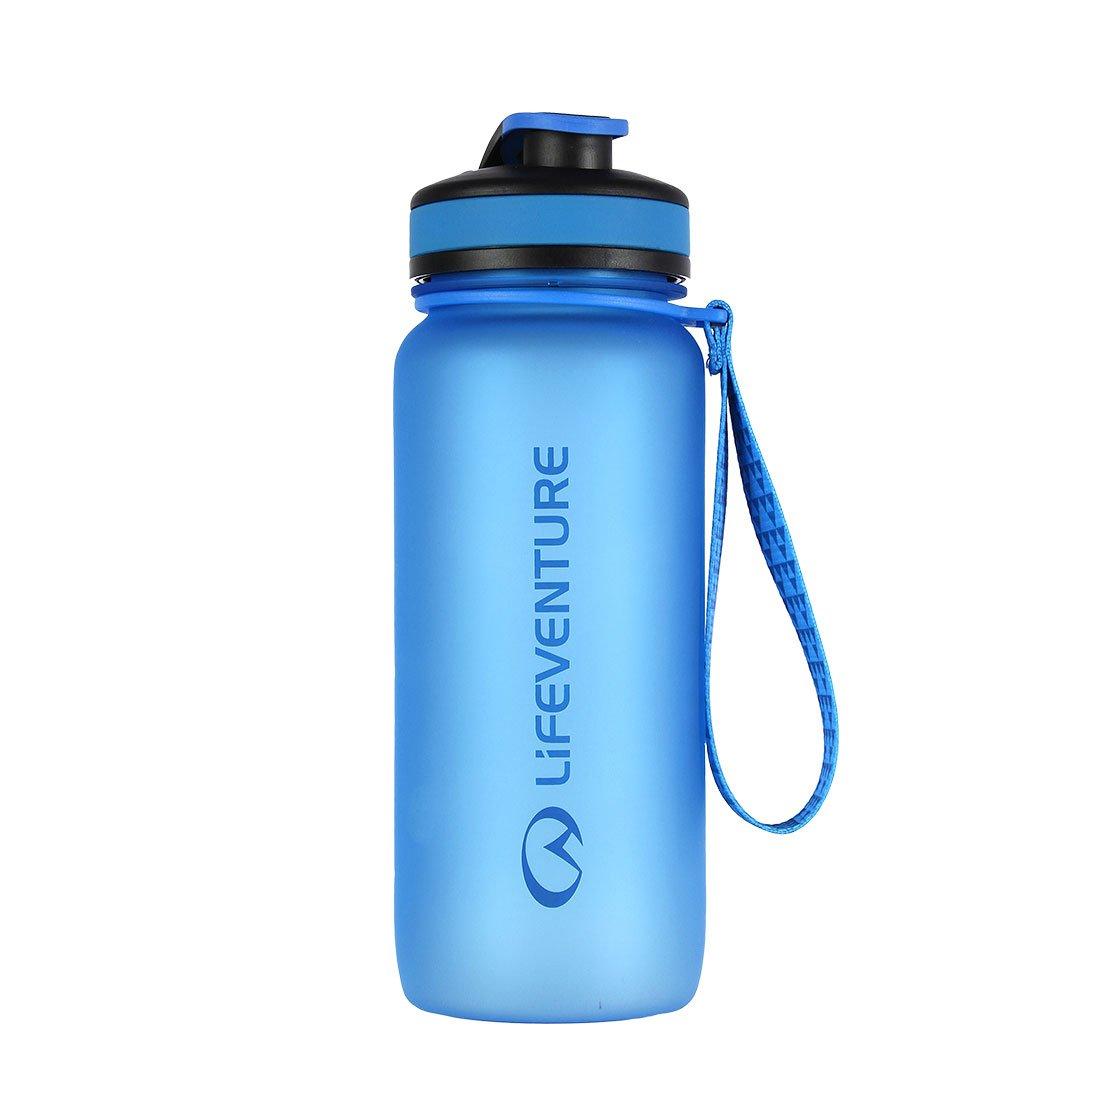 Tritan Water Bottle | Reusable Water Bottles